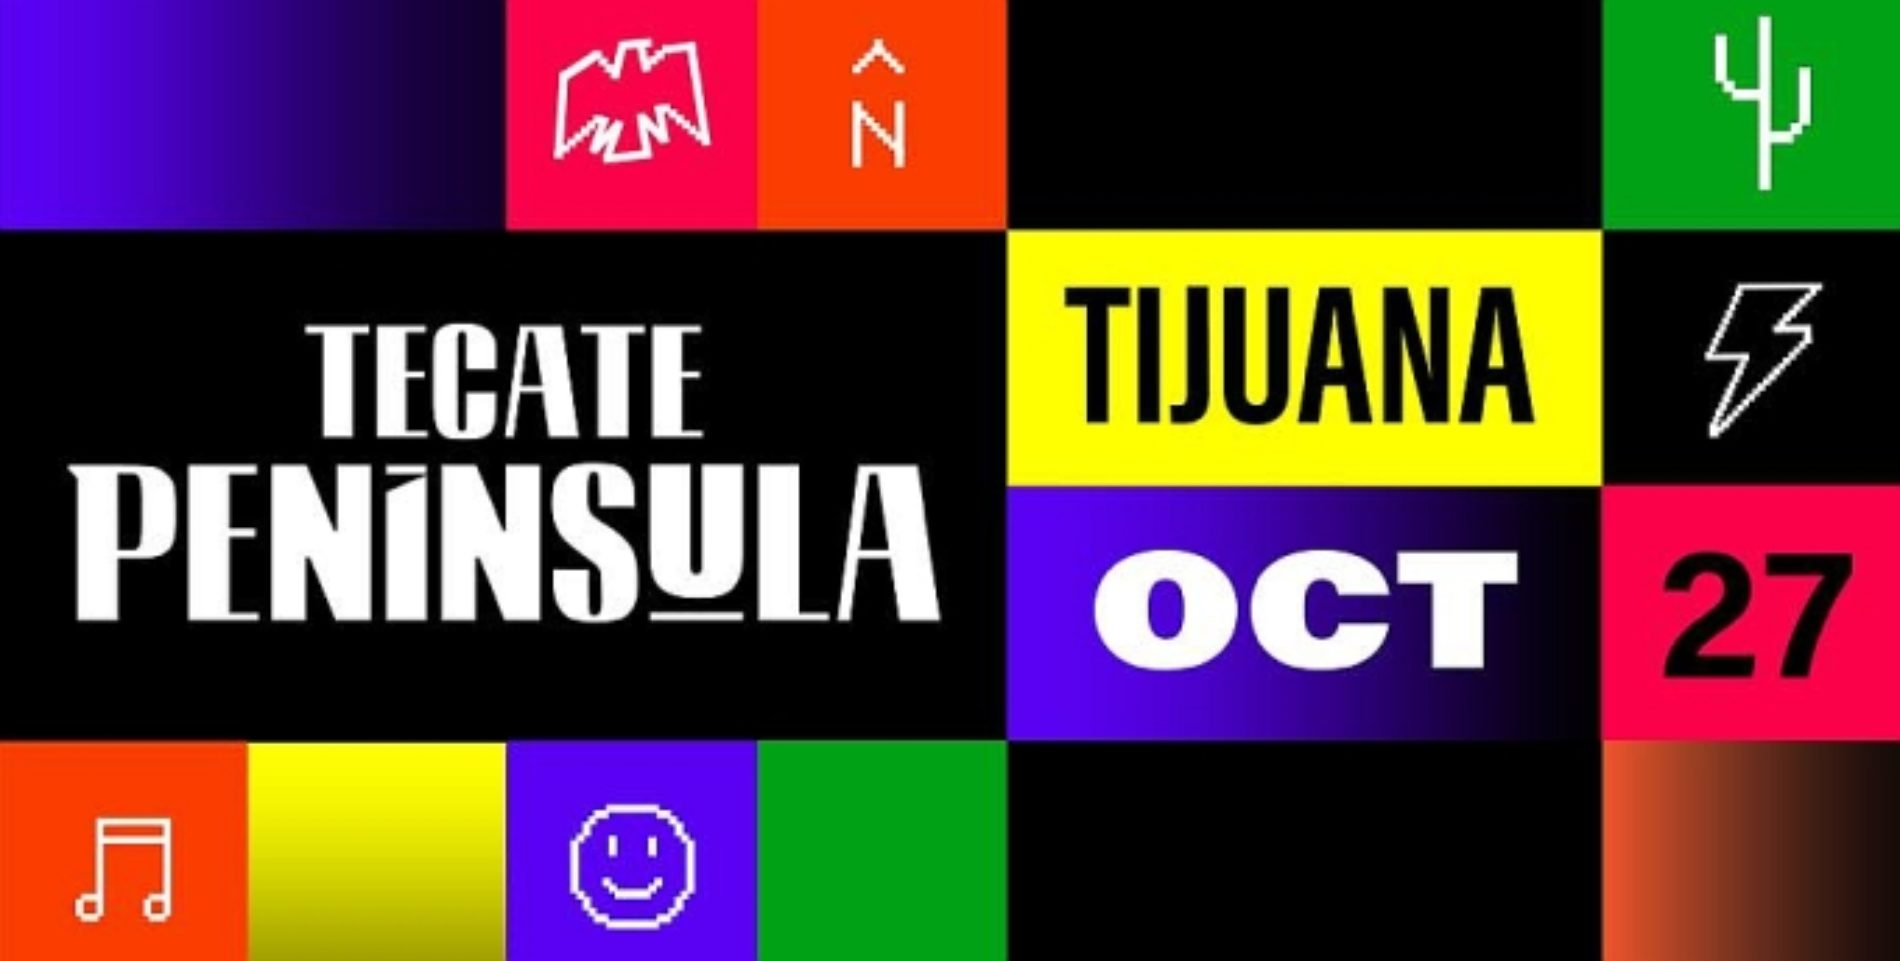 Tecate Peninsular Tijuana 2018